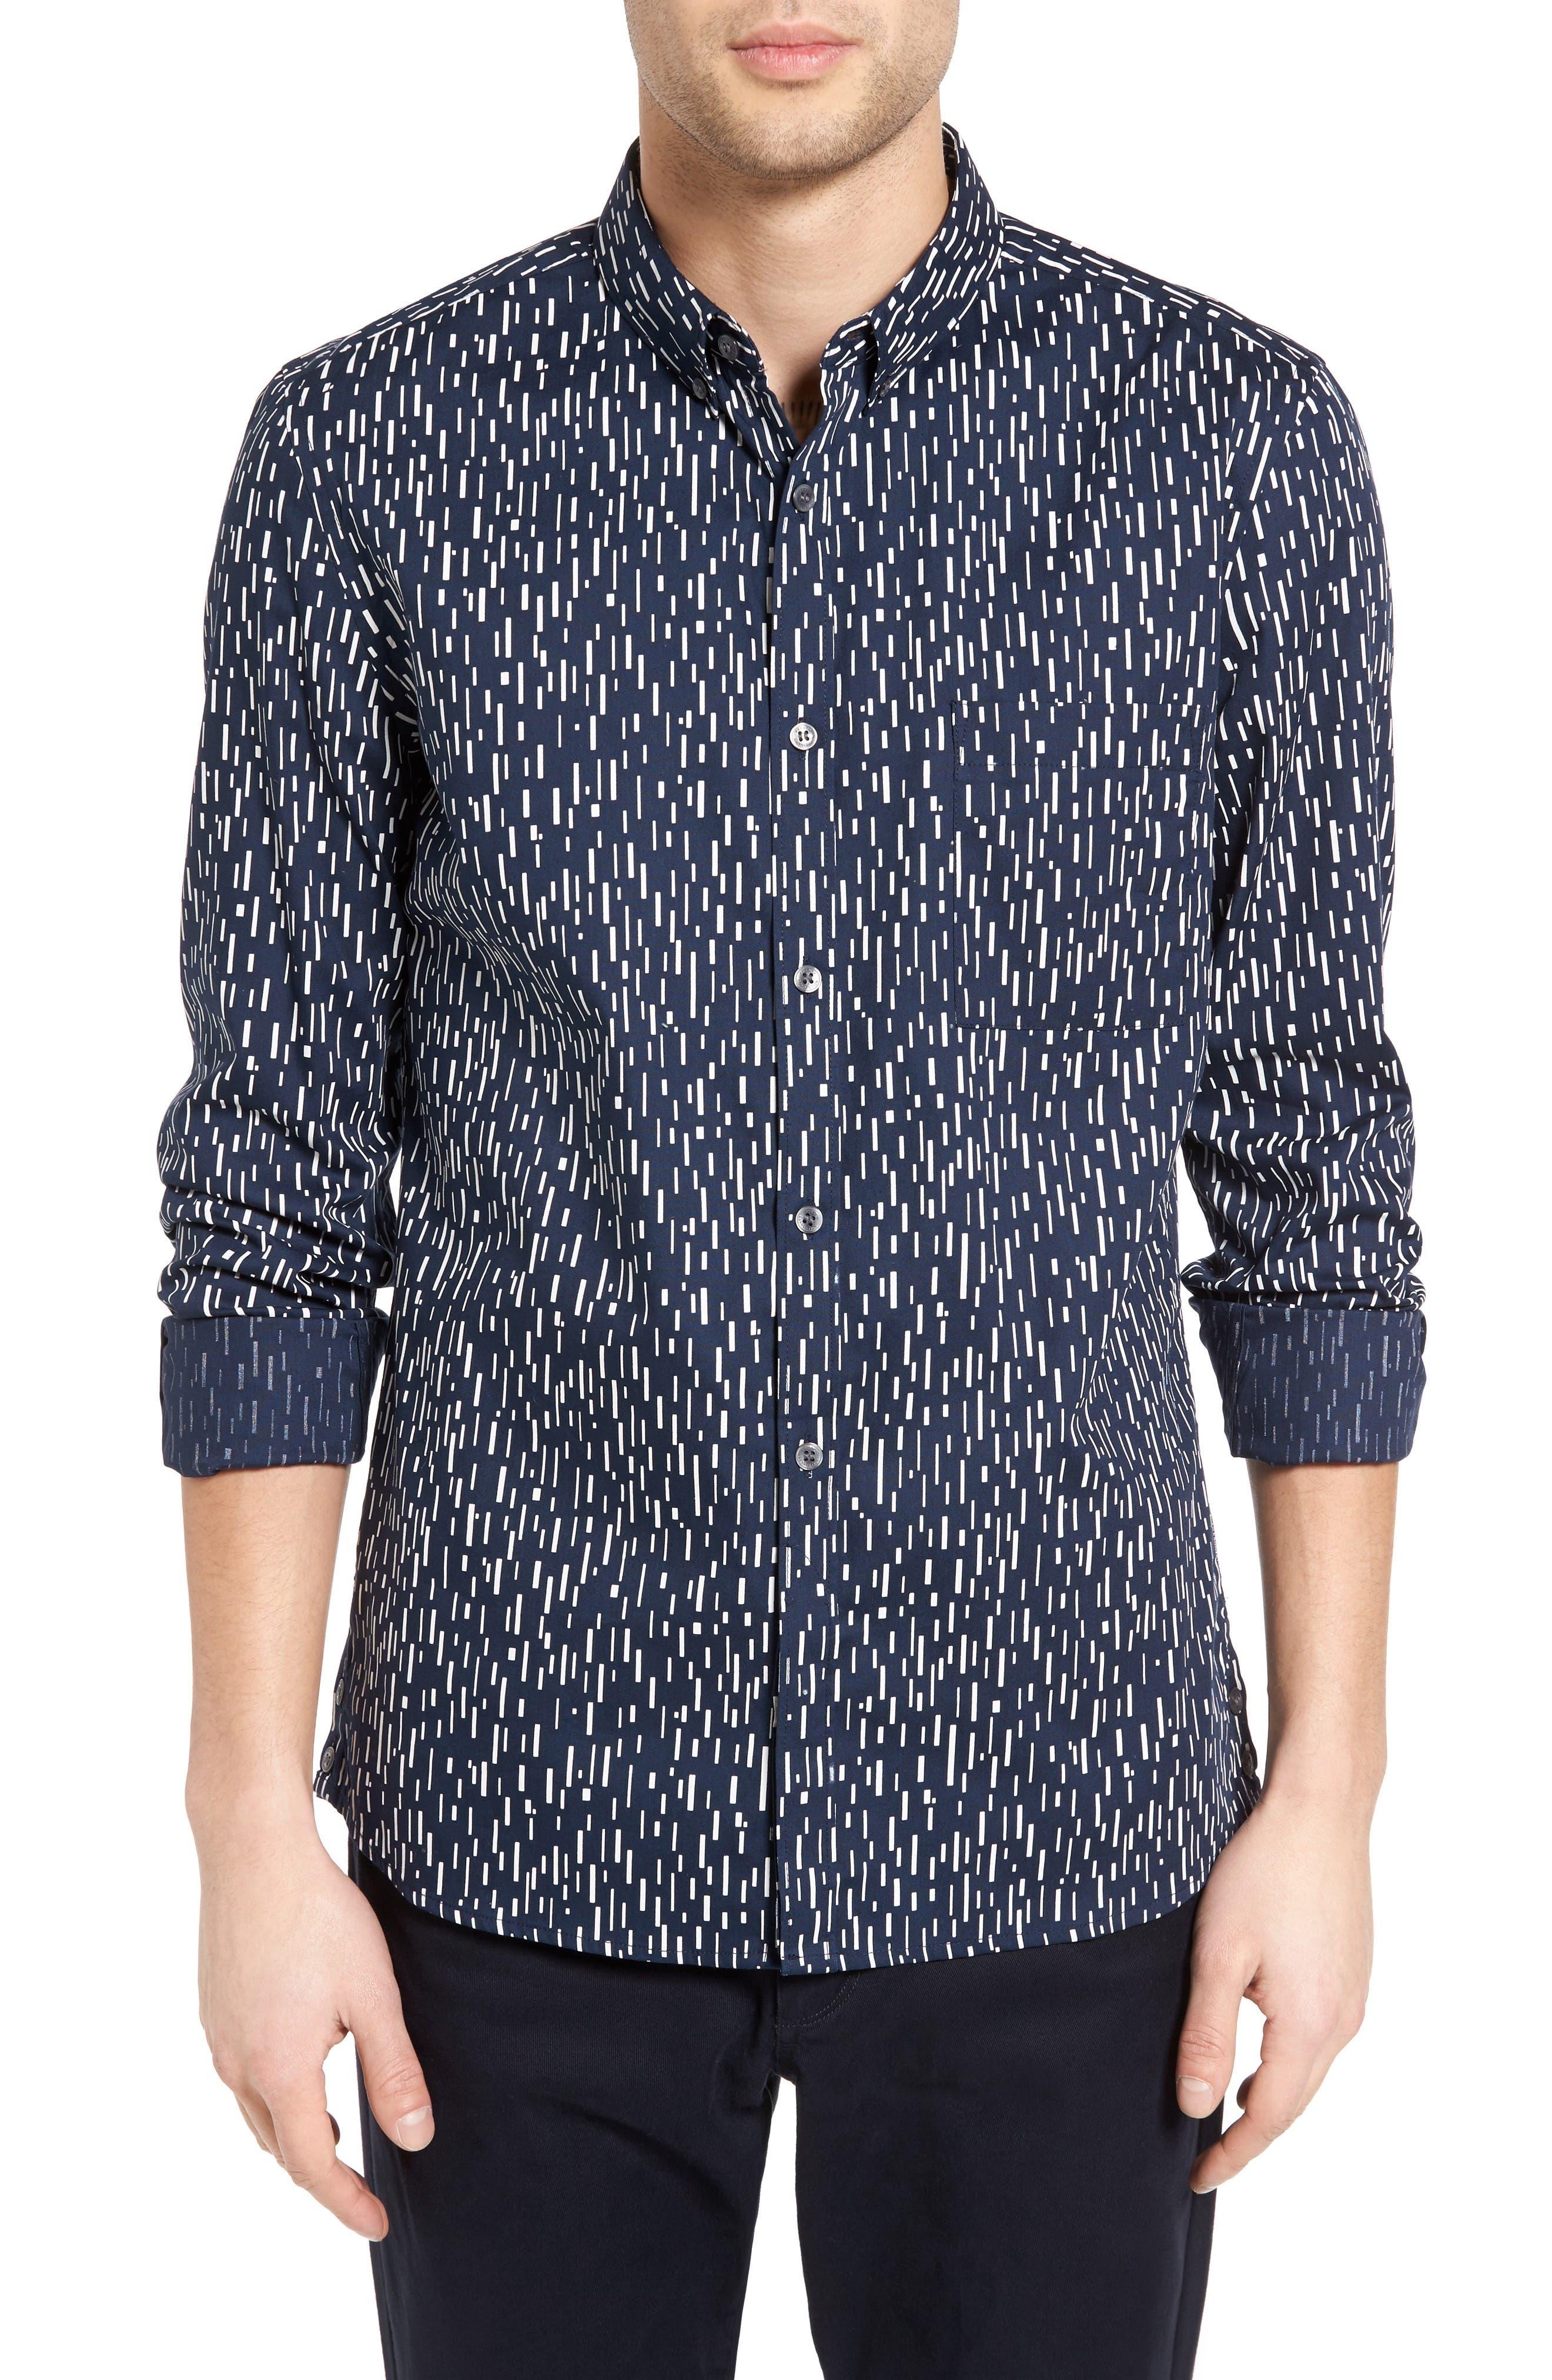 Rain Dash Slim Fit Oxford Shirt,                         Main,                         color, 407